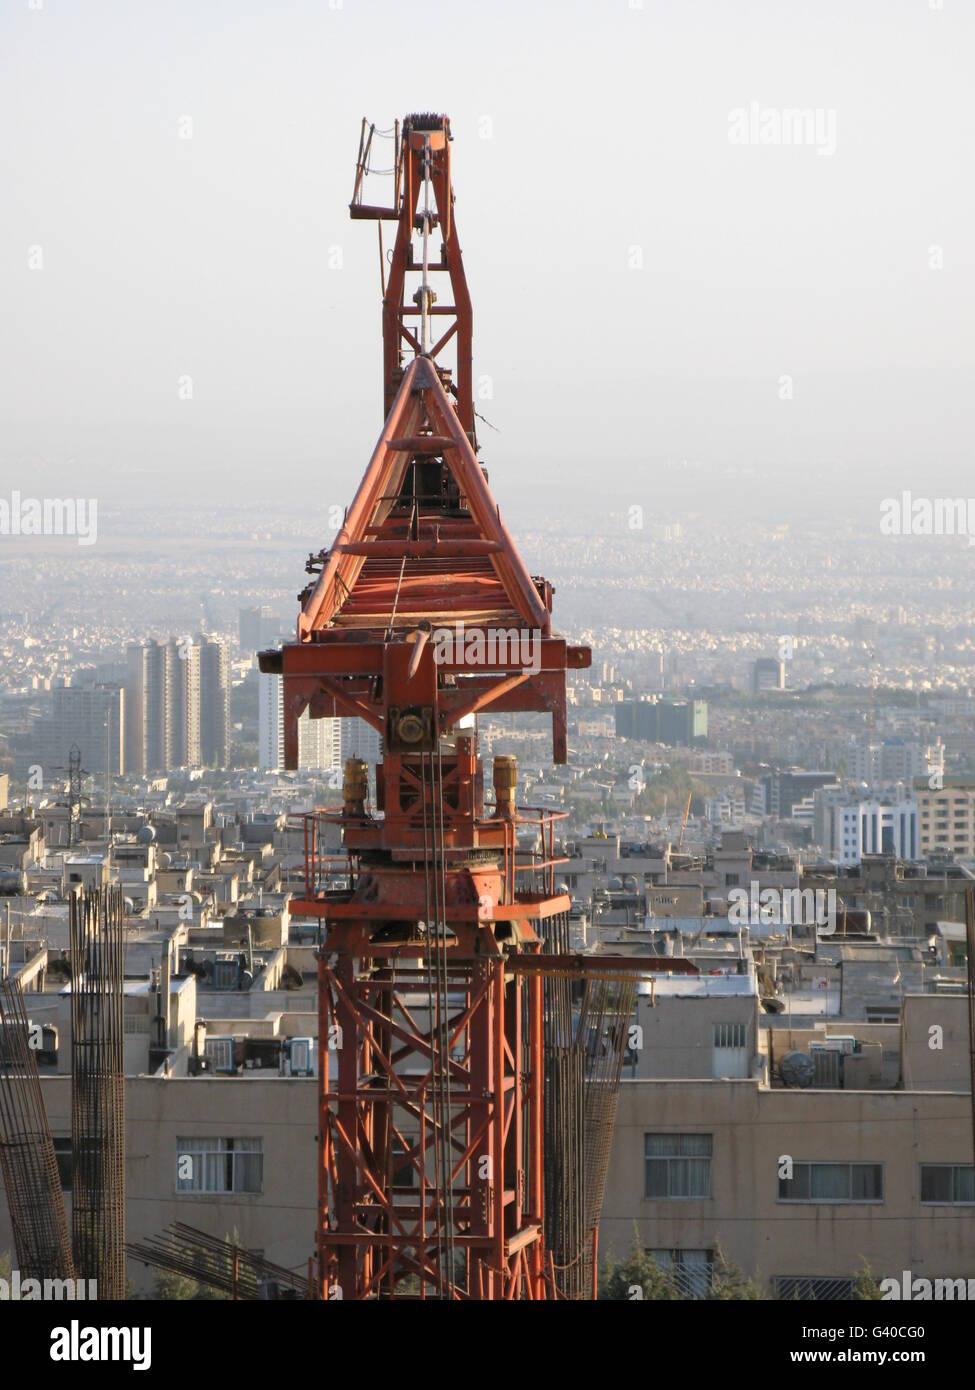 super crane on modern city - Stock Image